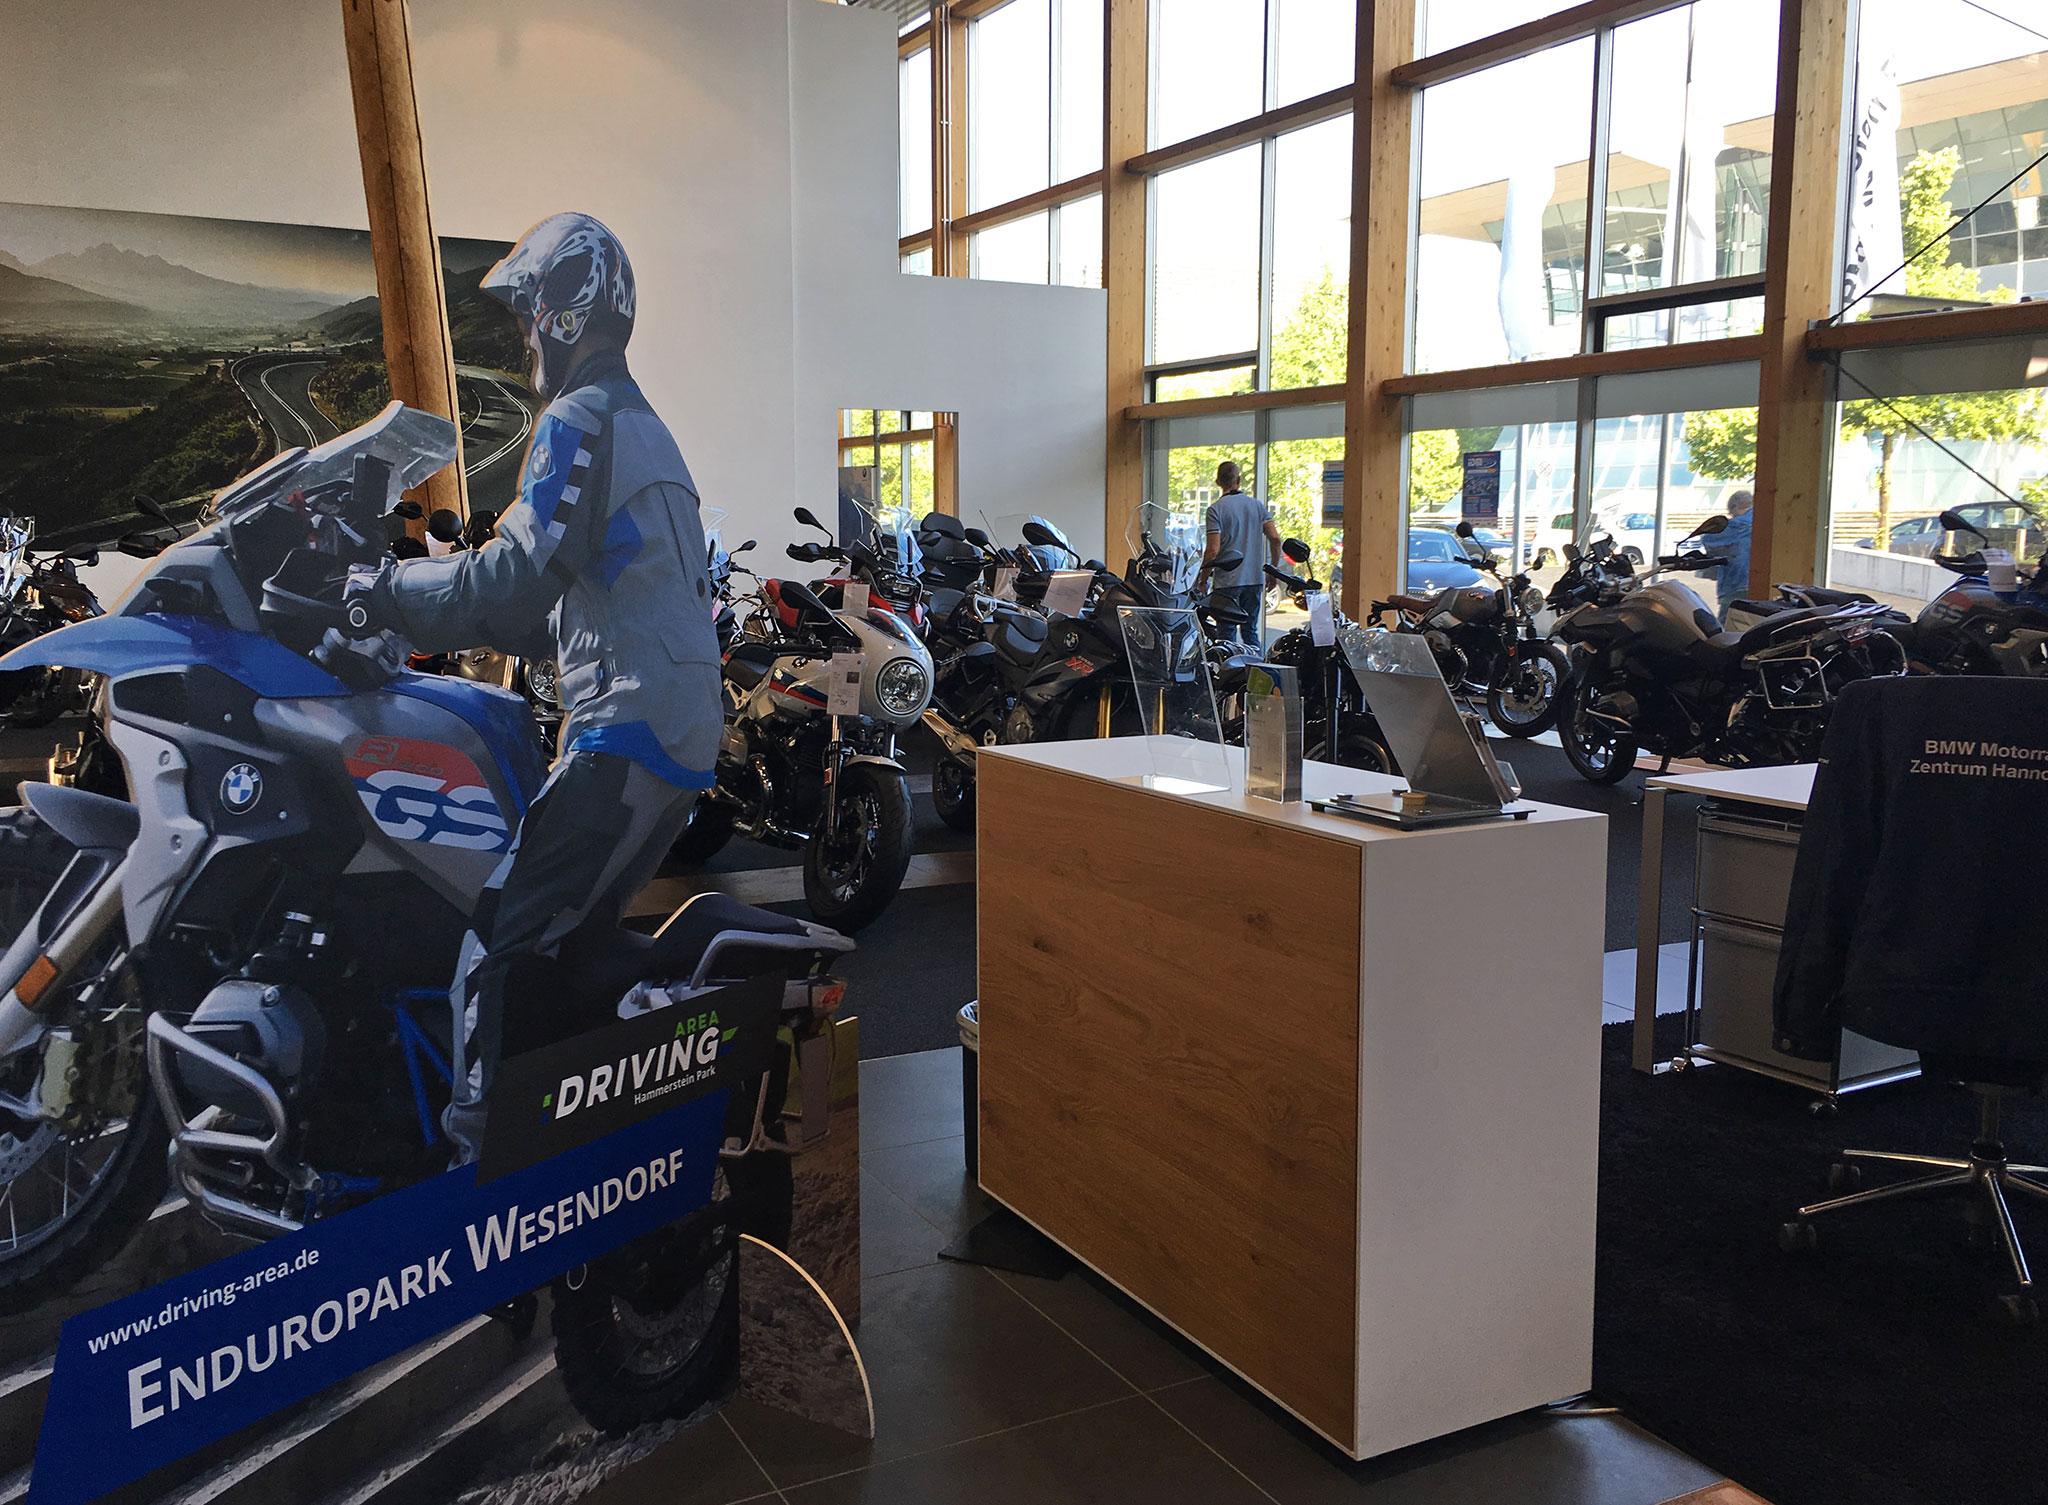 BMW Motorrad Zentrum Hannover